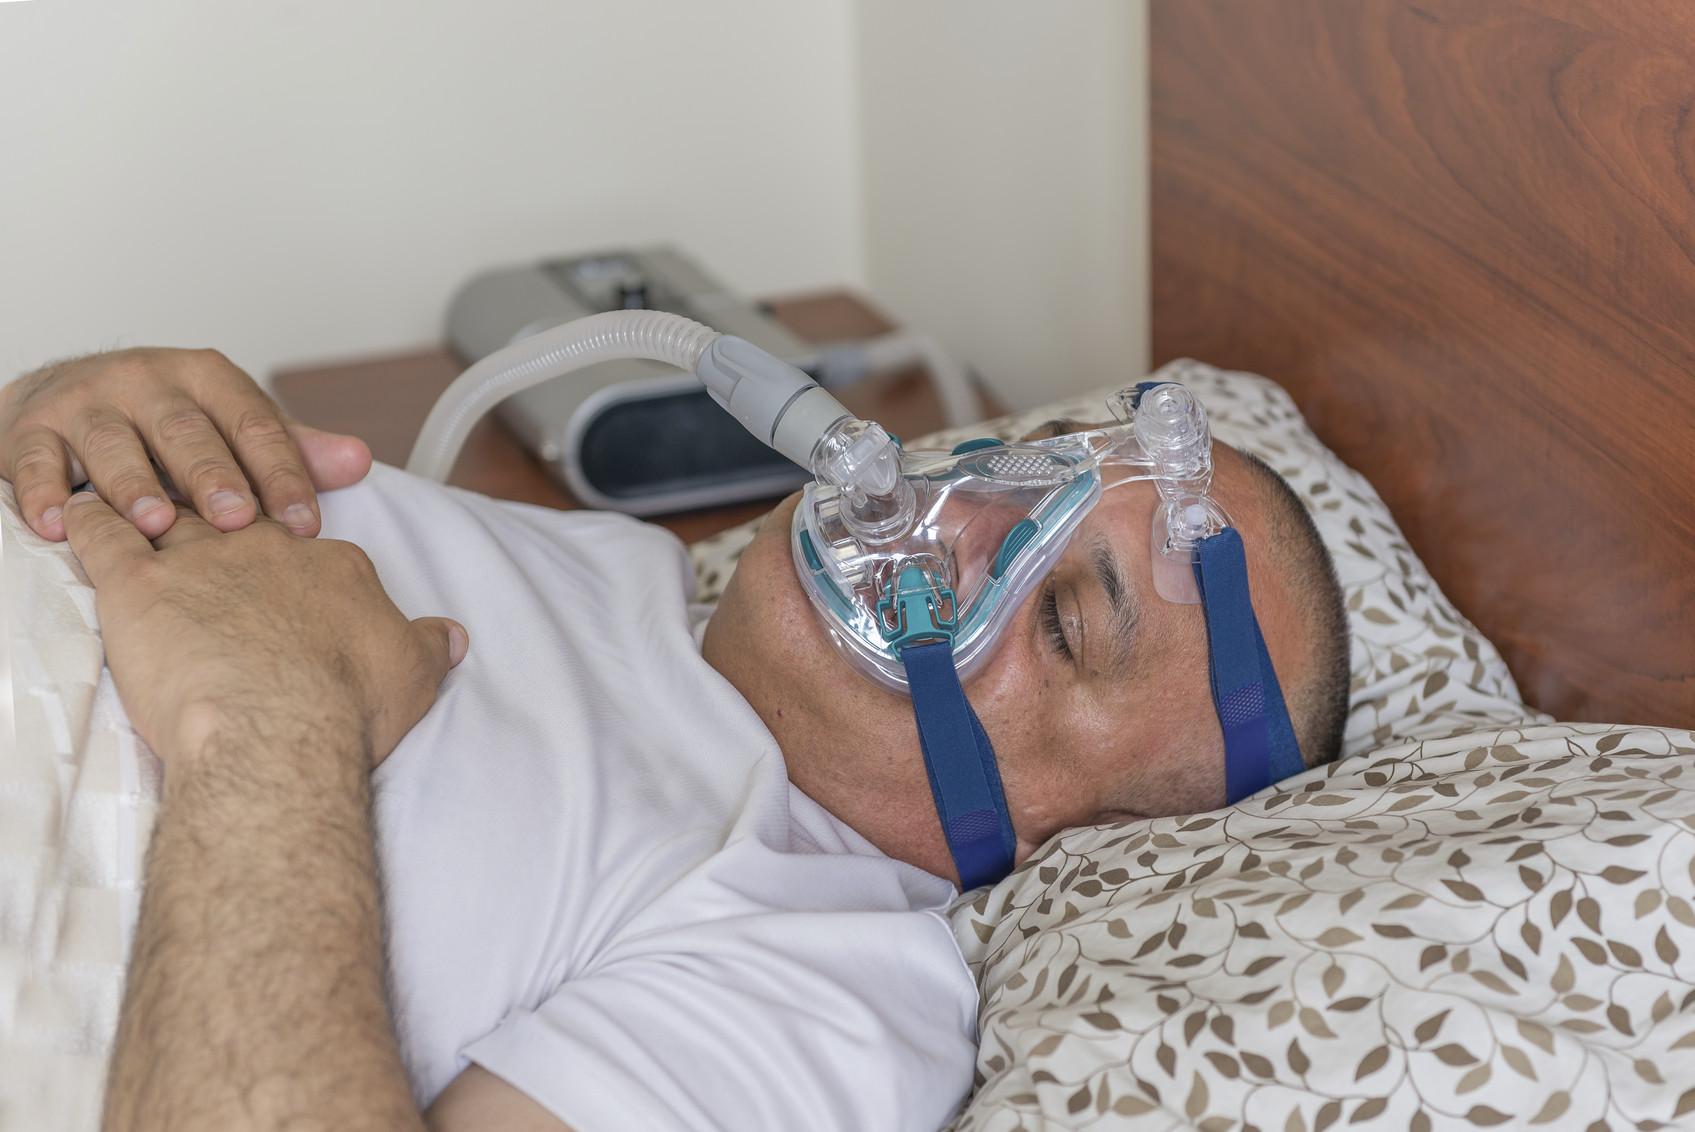 sleep-apnea-cpap-mask-snoring-yelo34-iStock_40127330_MEDIUM